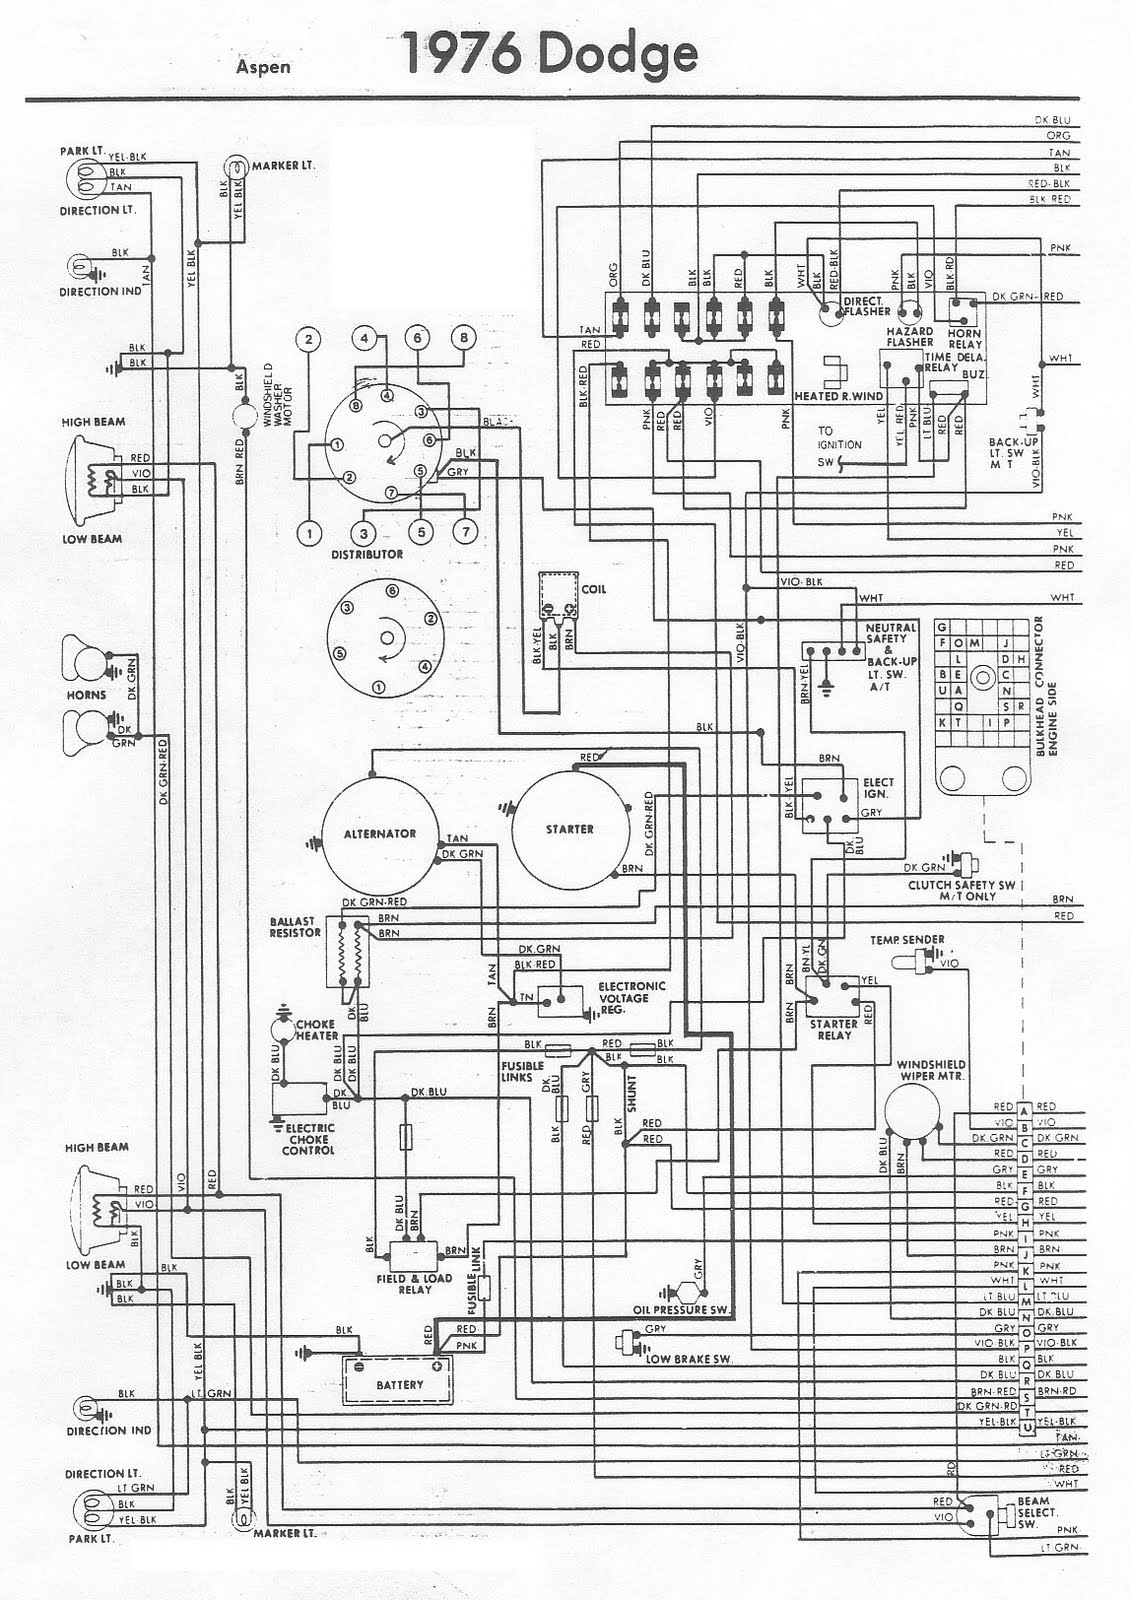 Chrysler Wiring Diagram Symbols Mitsubishi Truck Schematics Sumbols Library